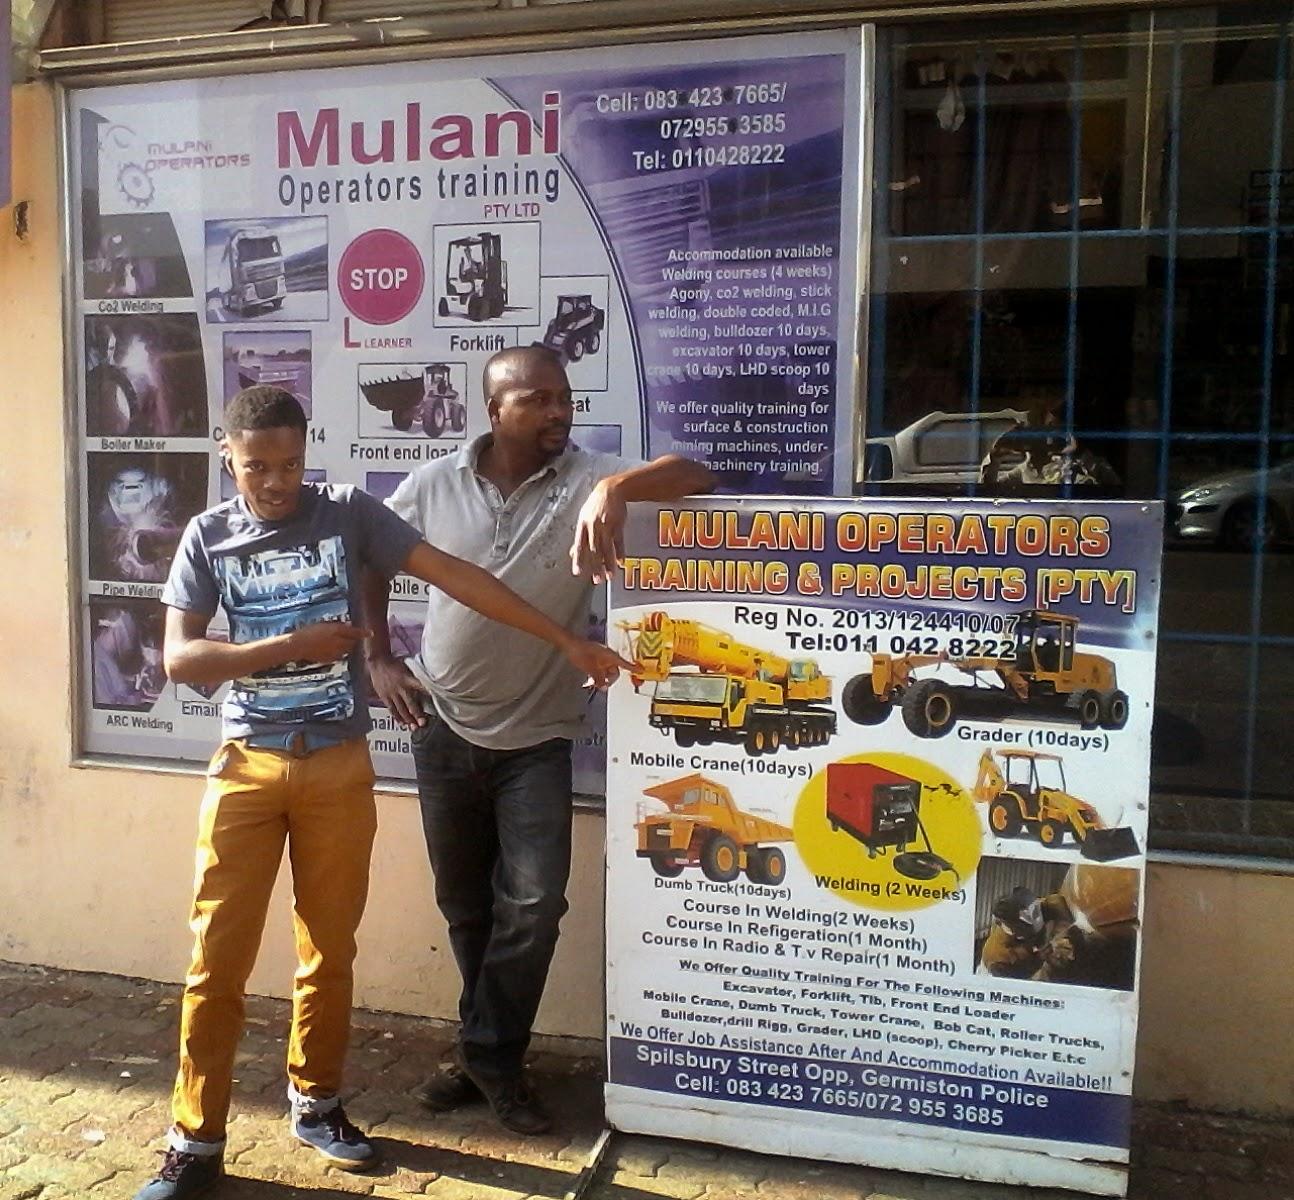 Mulani Operatorswelding Training School27731582436 May 2015